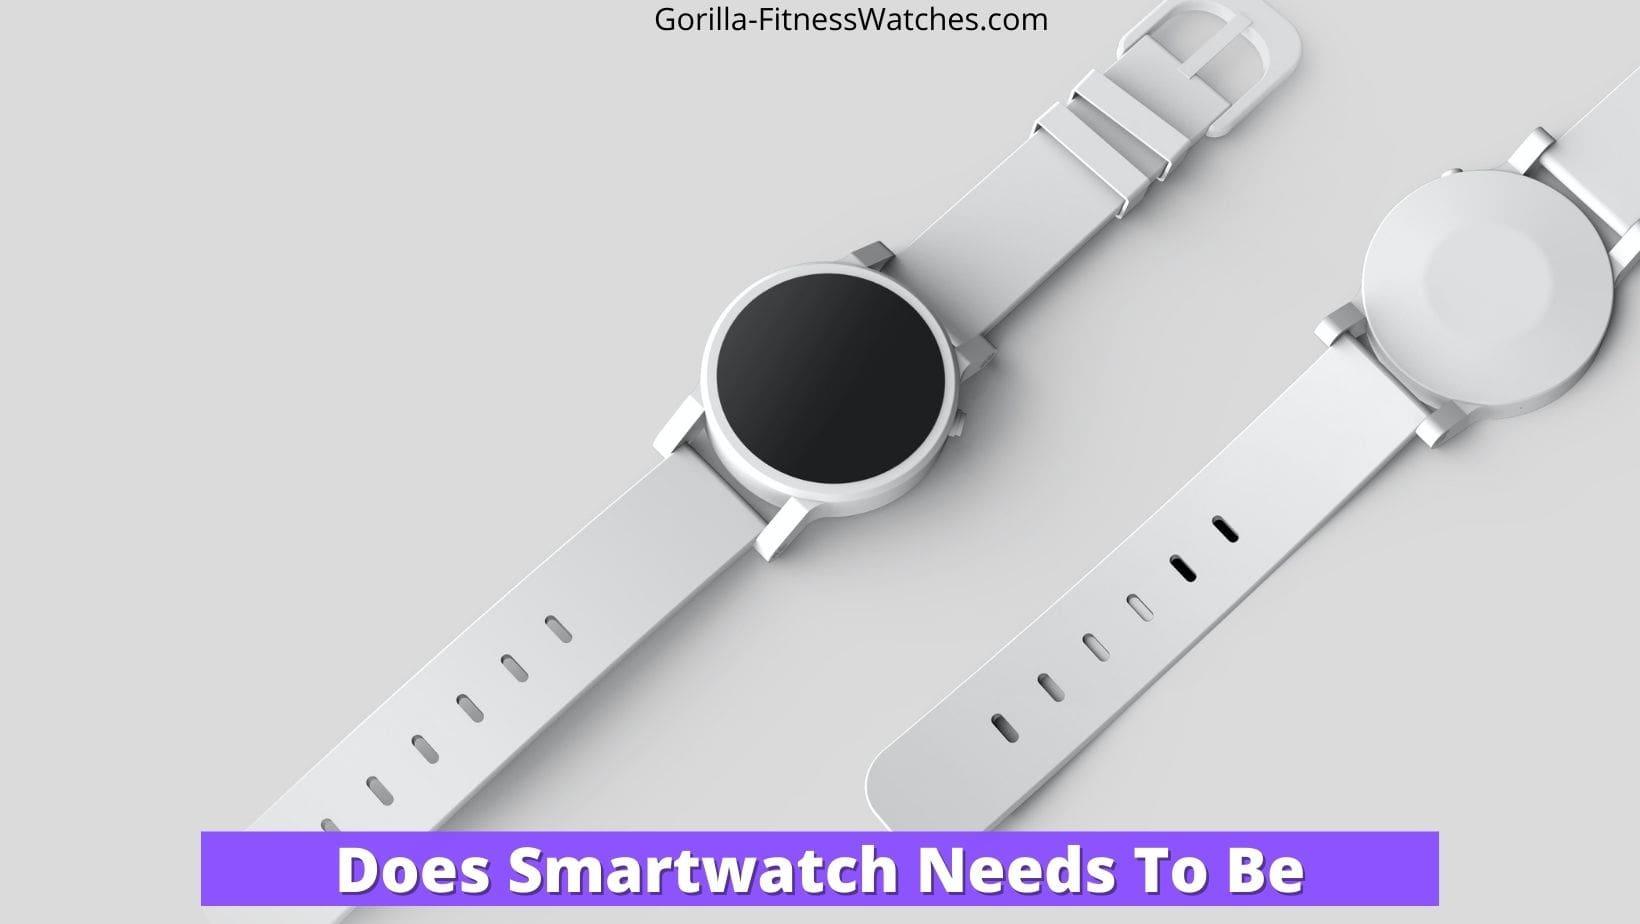 Smartwatch Needs To Be Near Phone